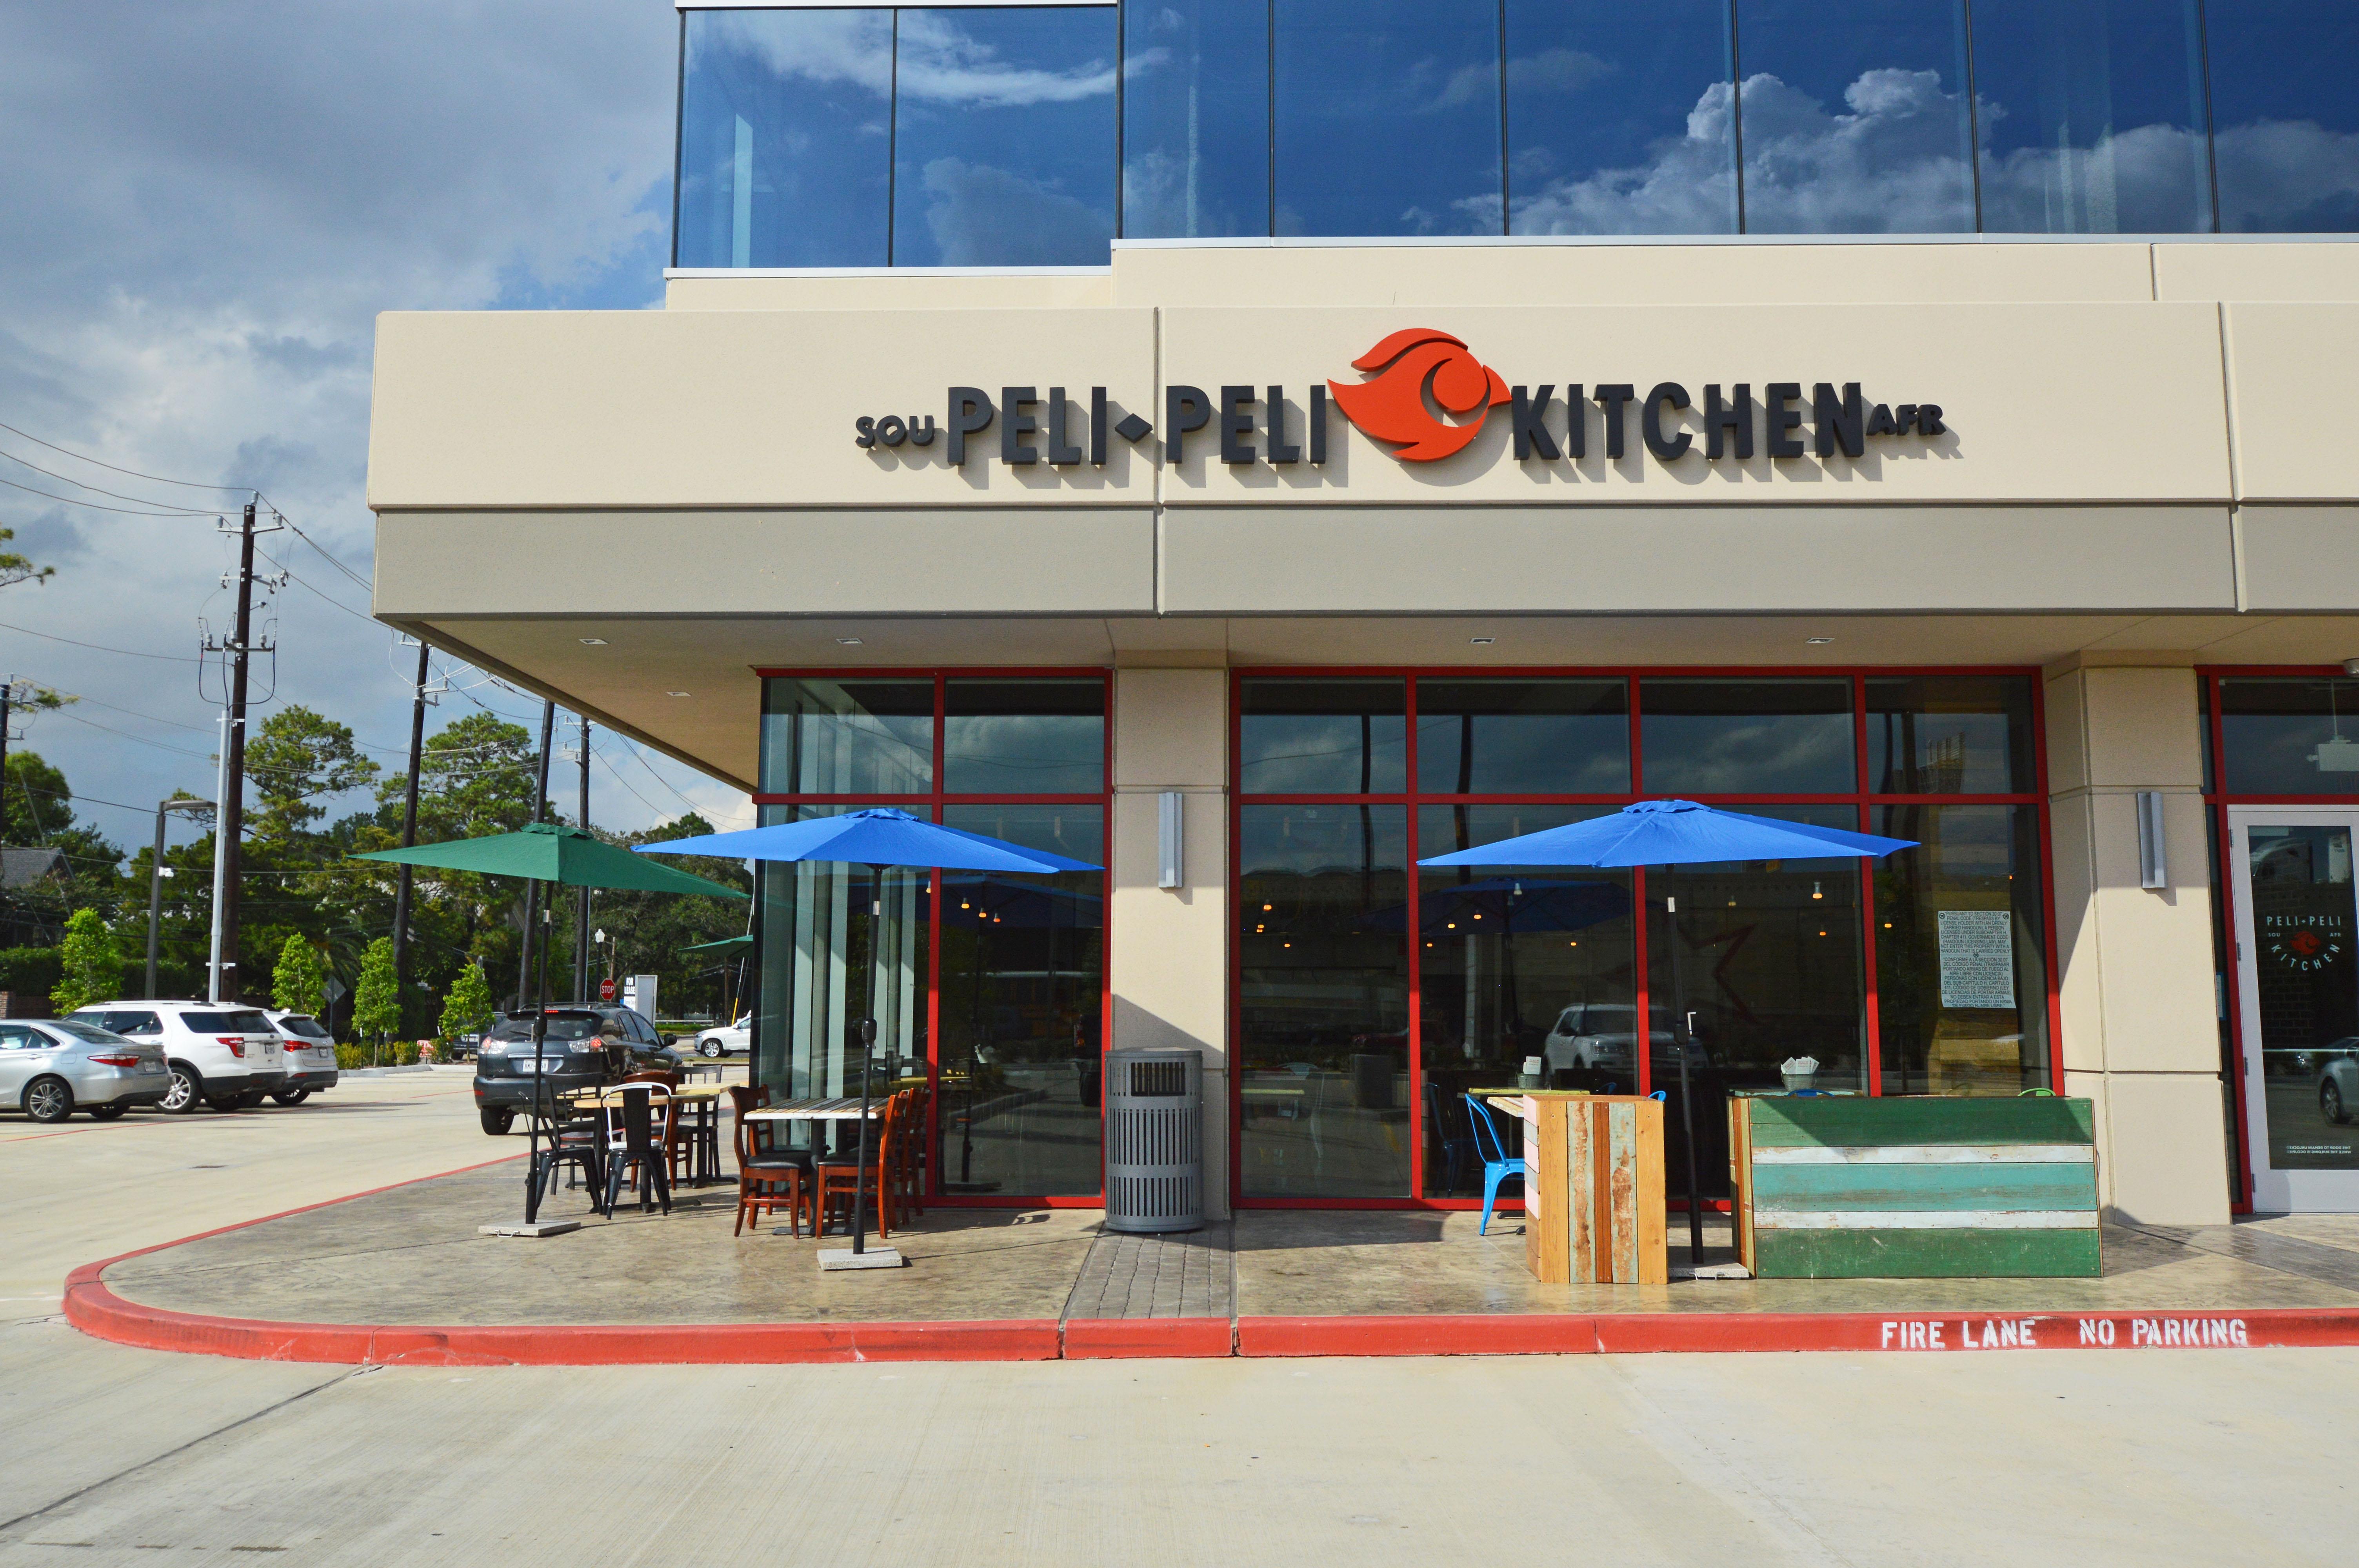 step inside peli peli kitchen houstons newest spot for quick south african fare - Peli Peli Kitchen